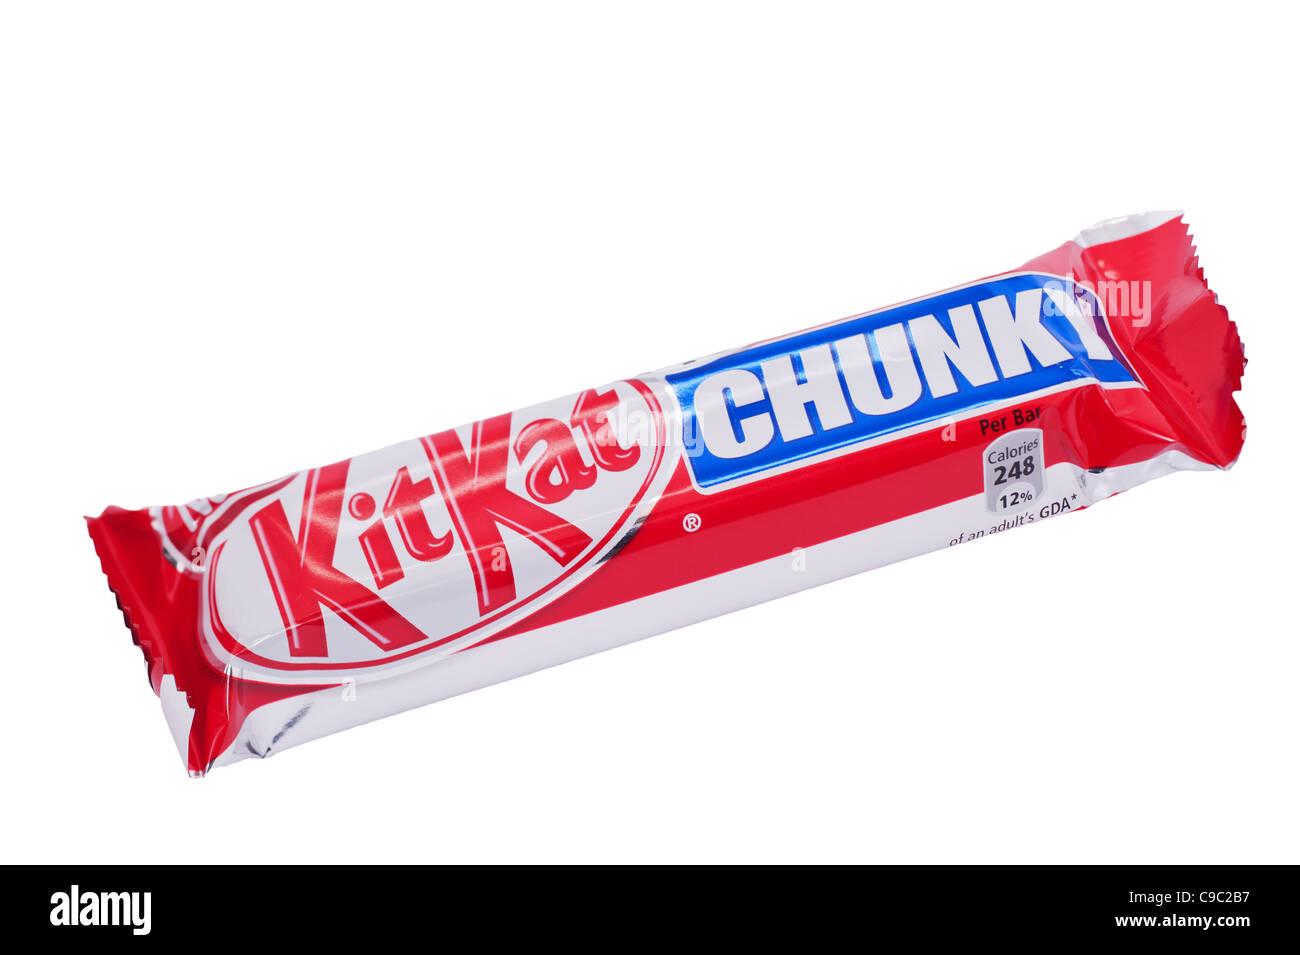 A Nestle chunky KitKat chocolate bar on a white background - Stock Image